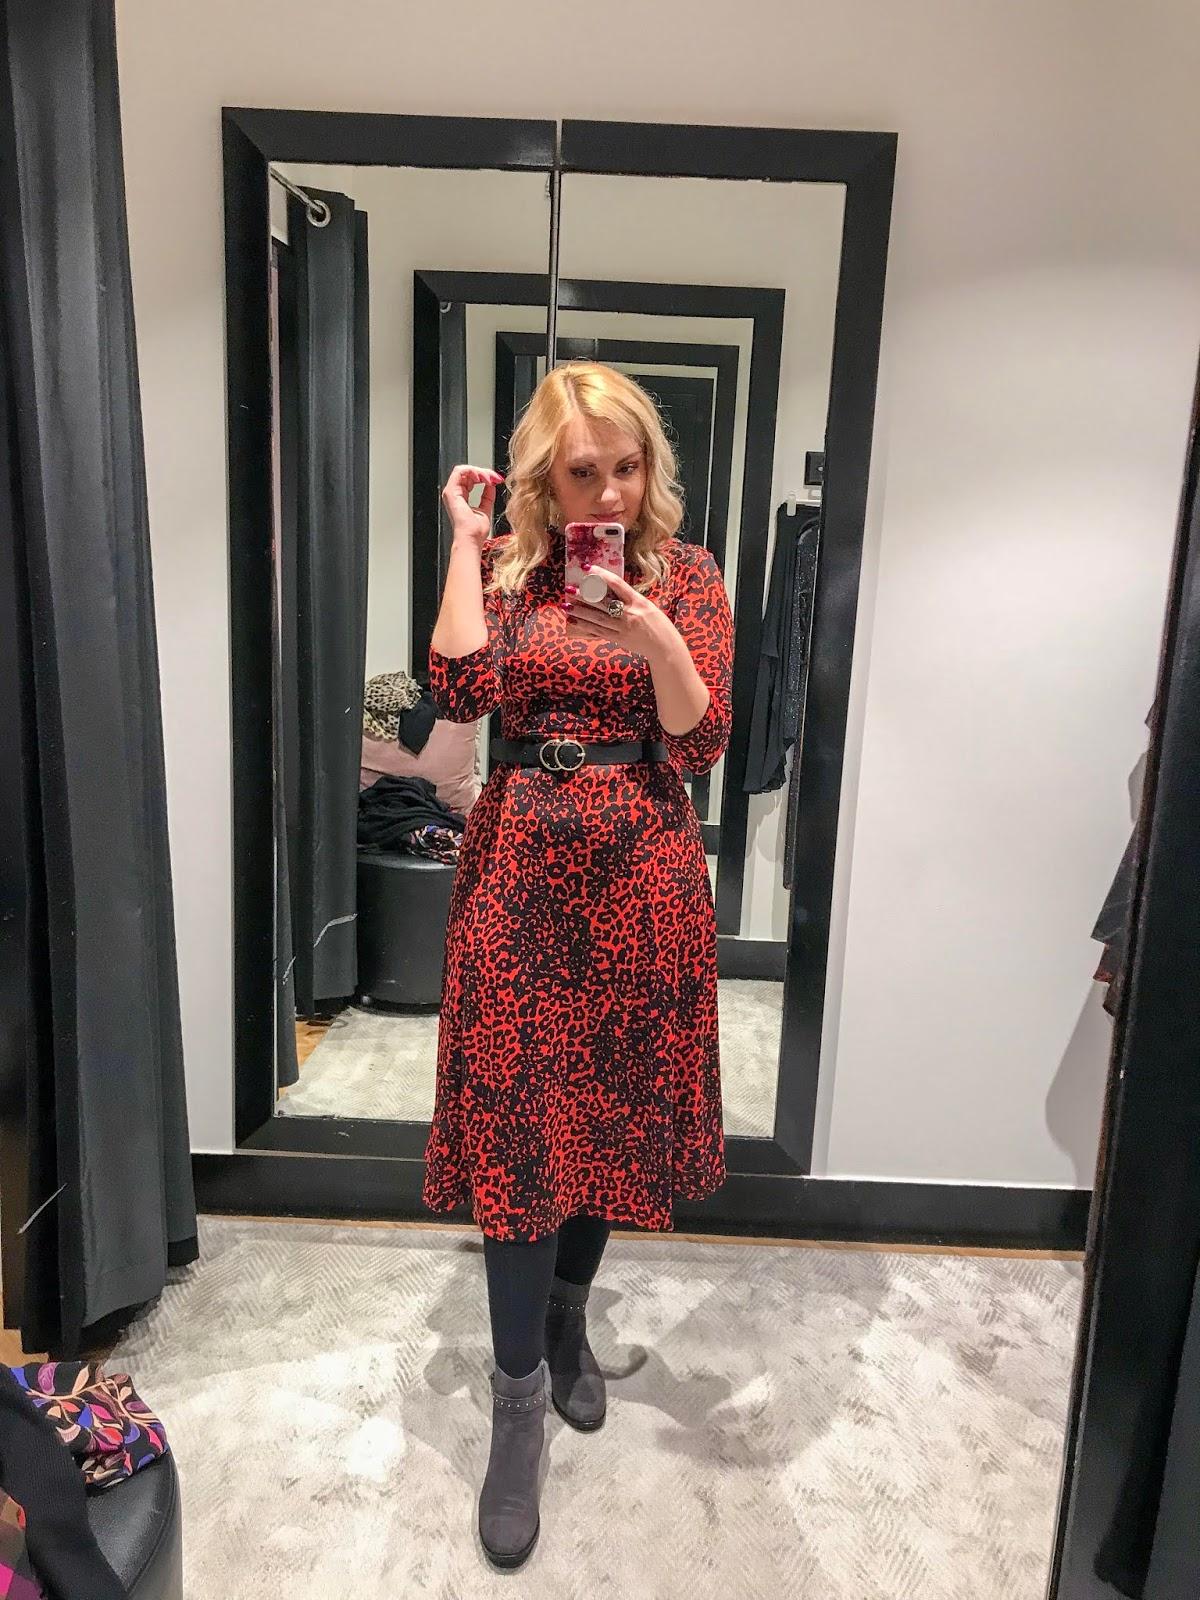 Debenhams Pamper Day & Personal Shopping, Debenhams Brighton, Brighton Blogger, UK Blogger, Katie Kirk Loves, Debenhams Personal Shopper, Elizabeth Arden, Urban Decay, Cherry Eye Shadow Palette